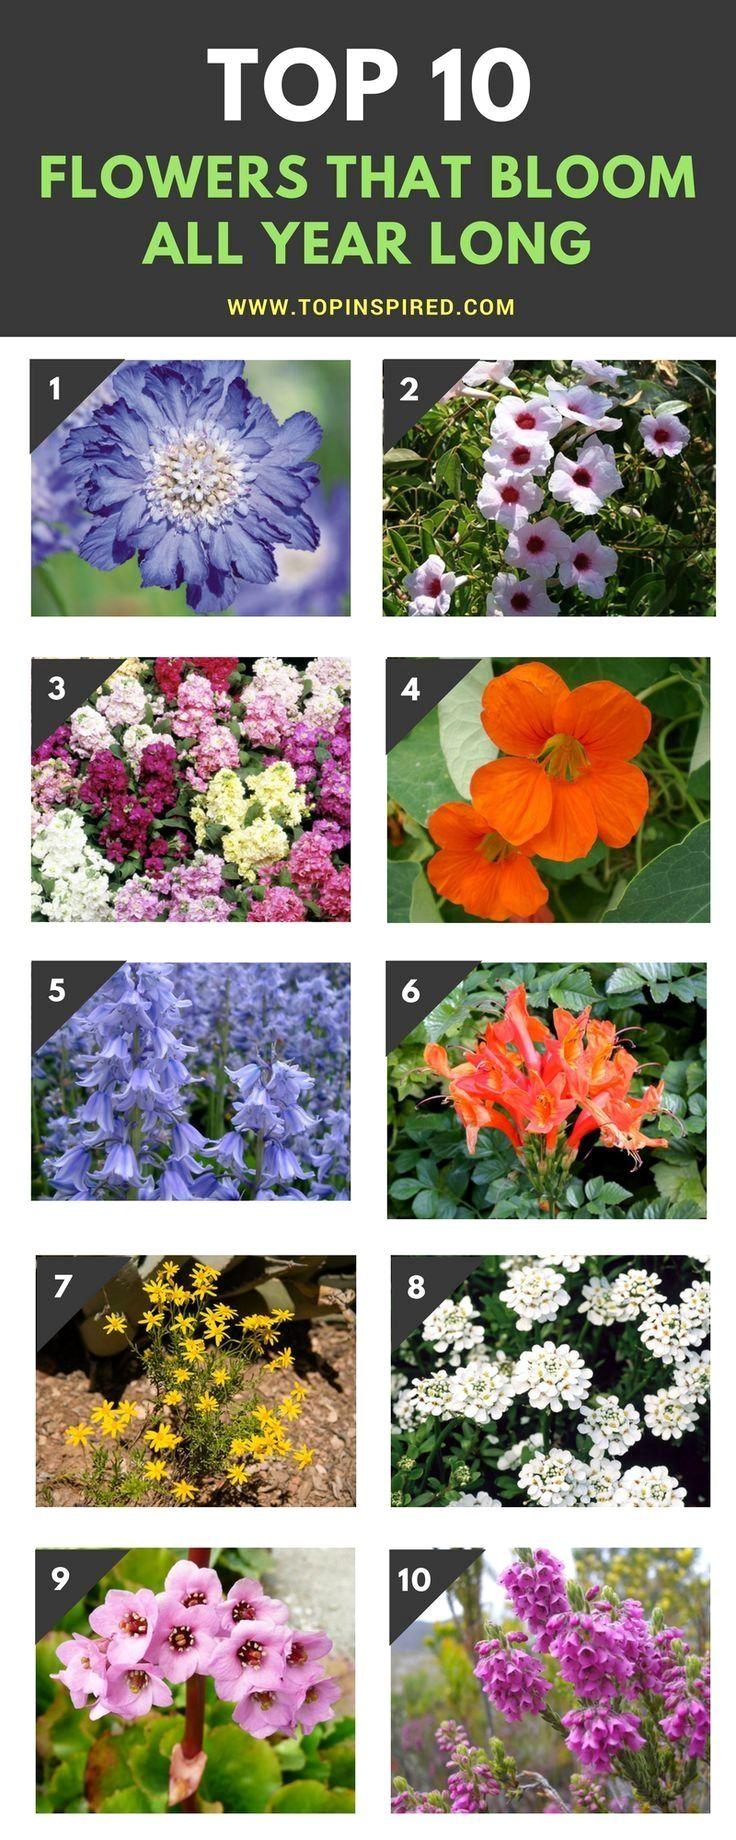 Top 10 Wonderful Flowers That Bloom All Year Long Plants